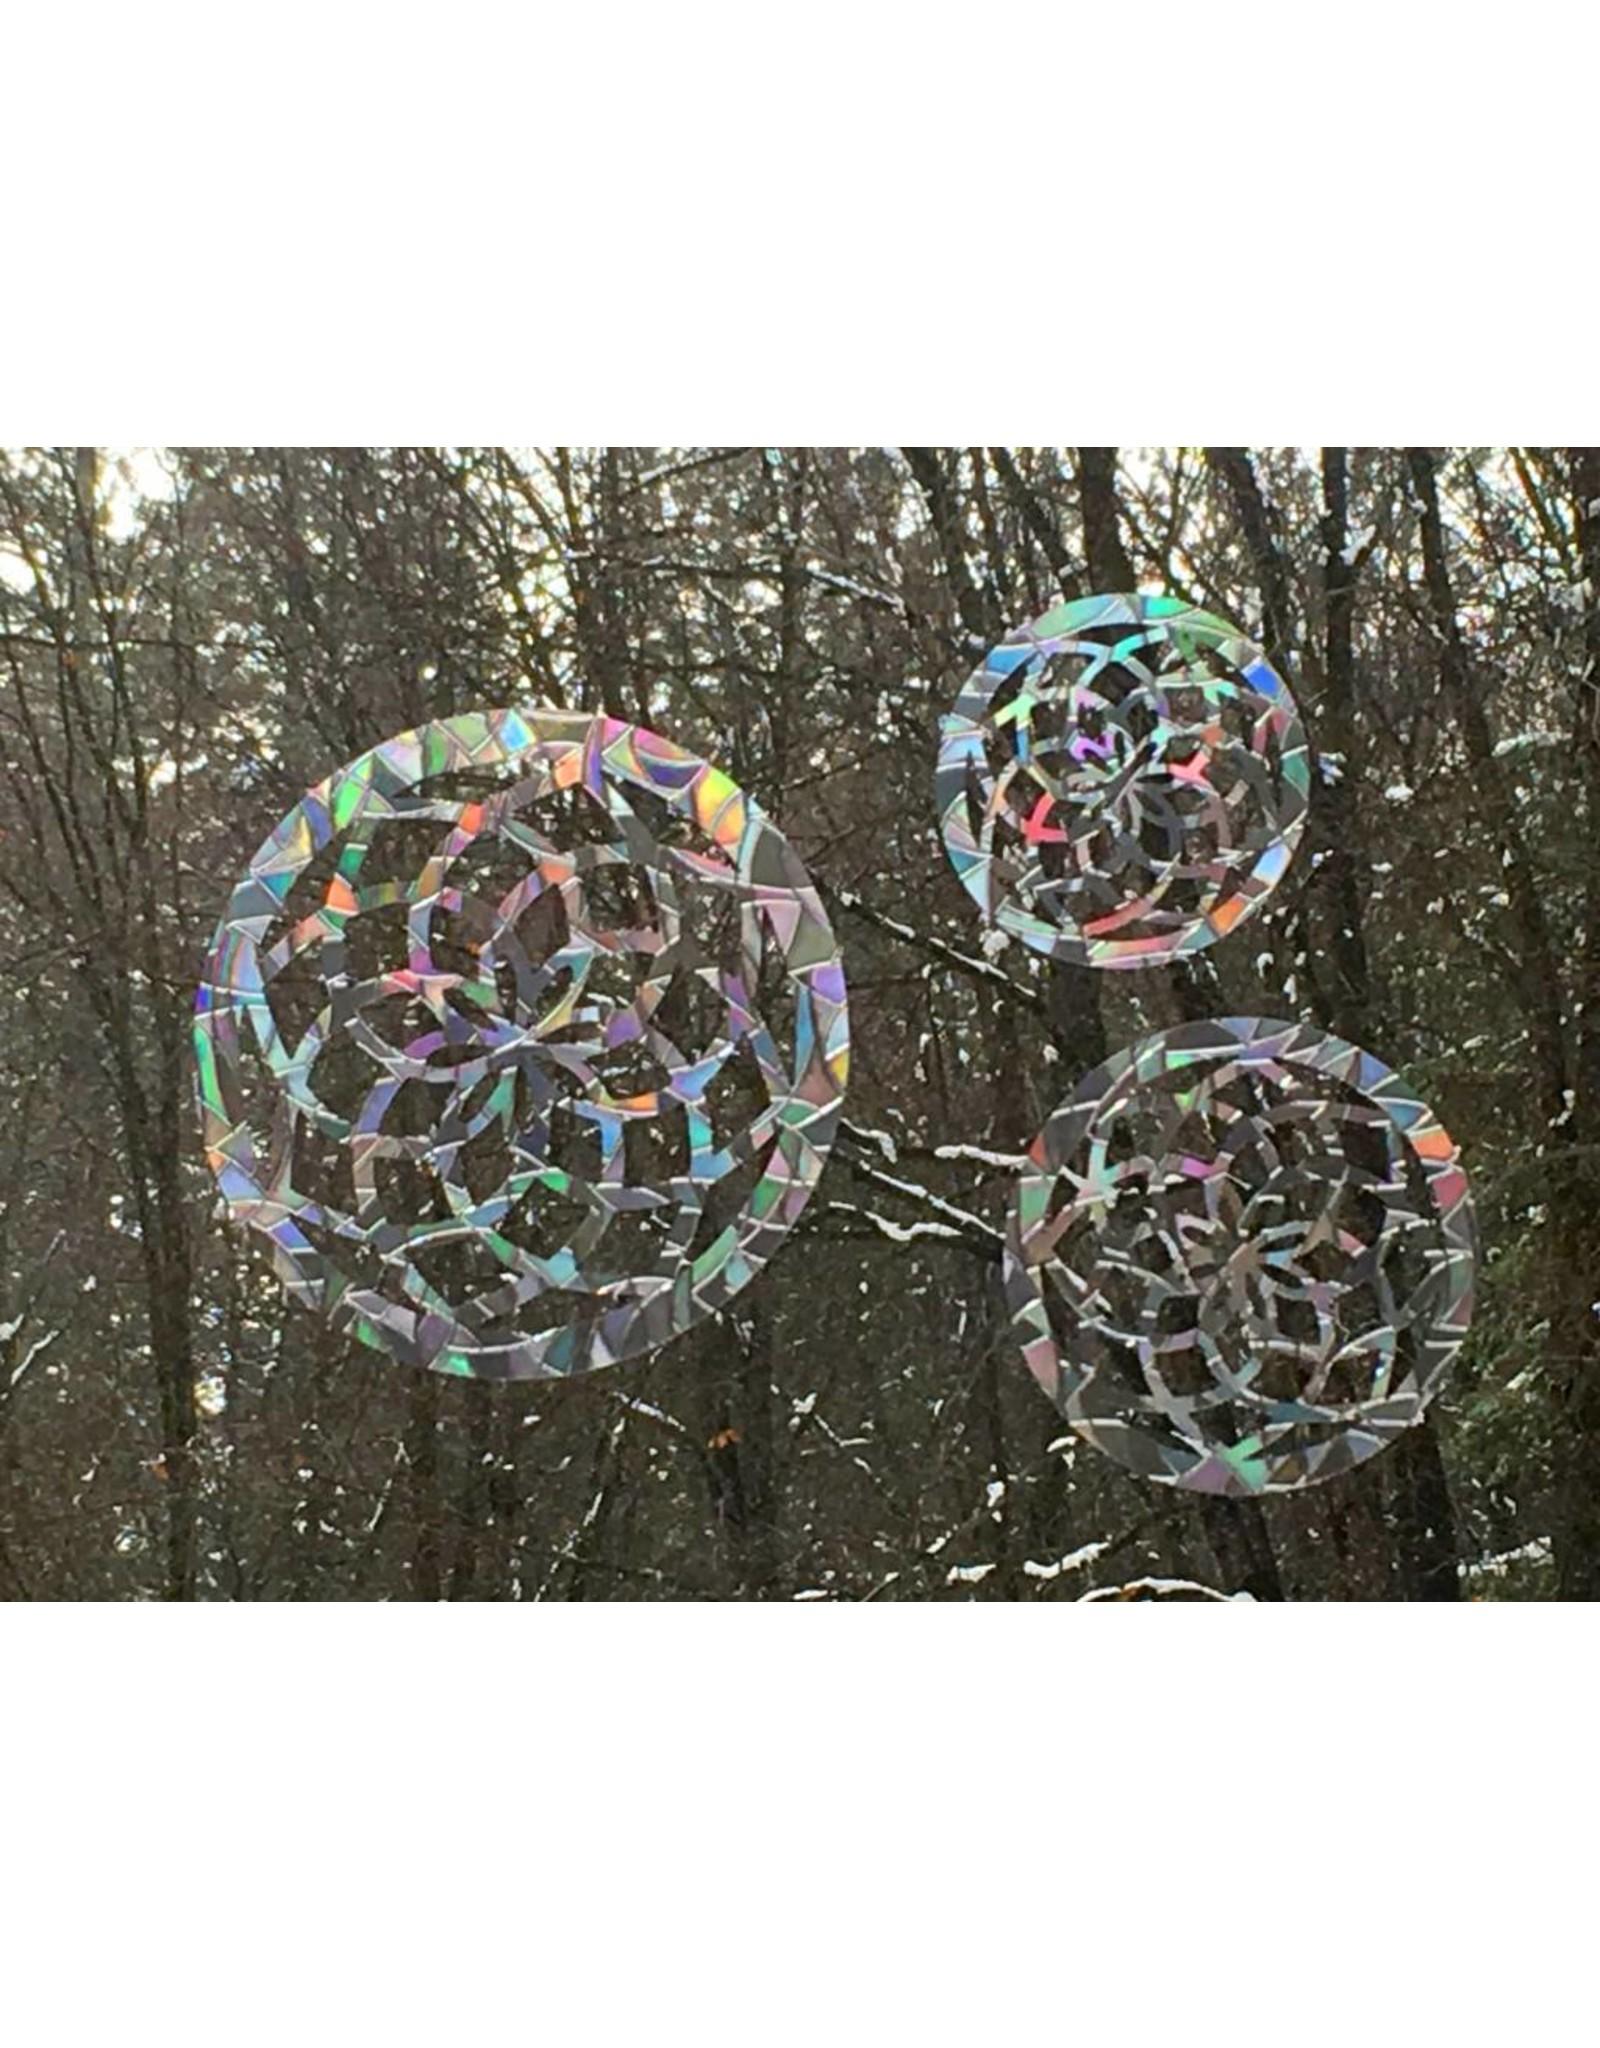 Baby Cricket Window Gems, Sacred Geometry Mandala, Pack of 3, Made in Mt Shasta!